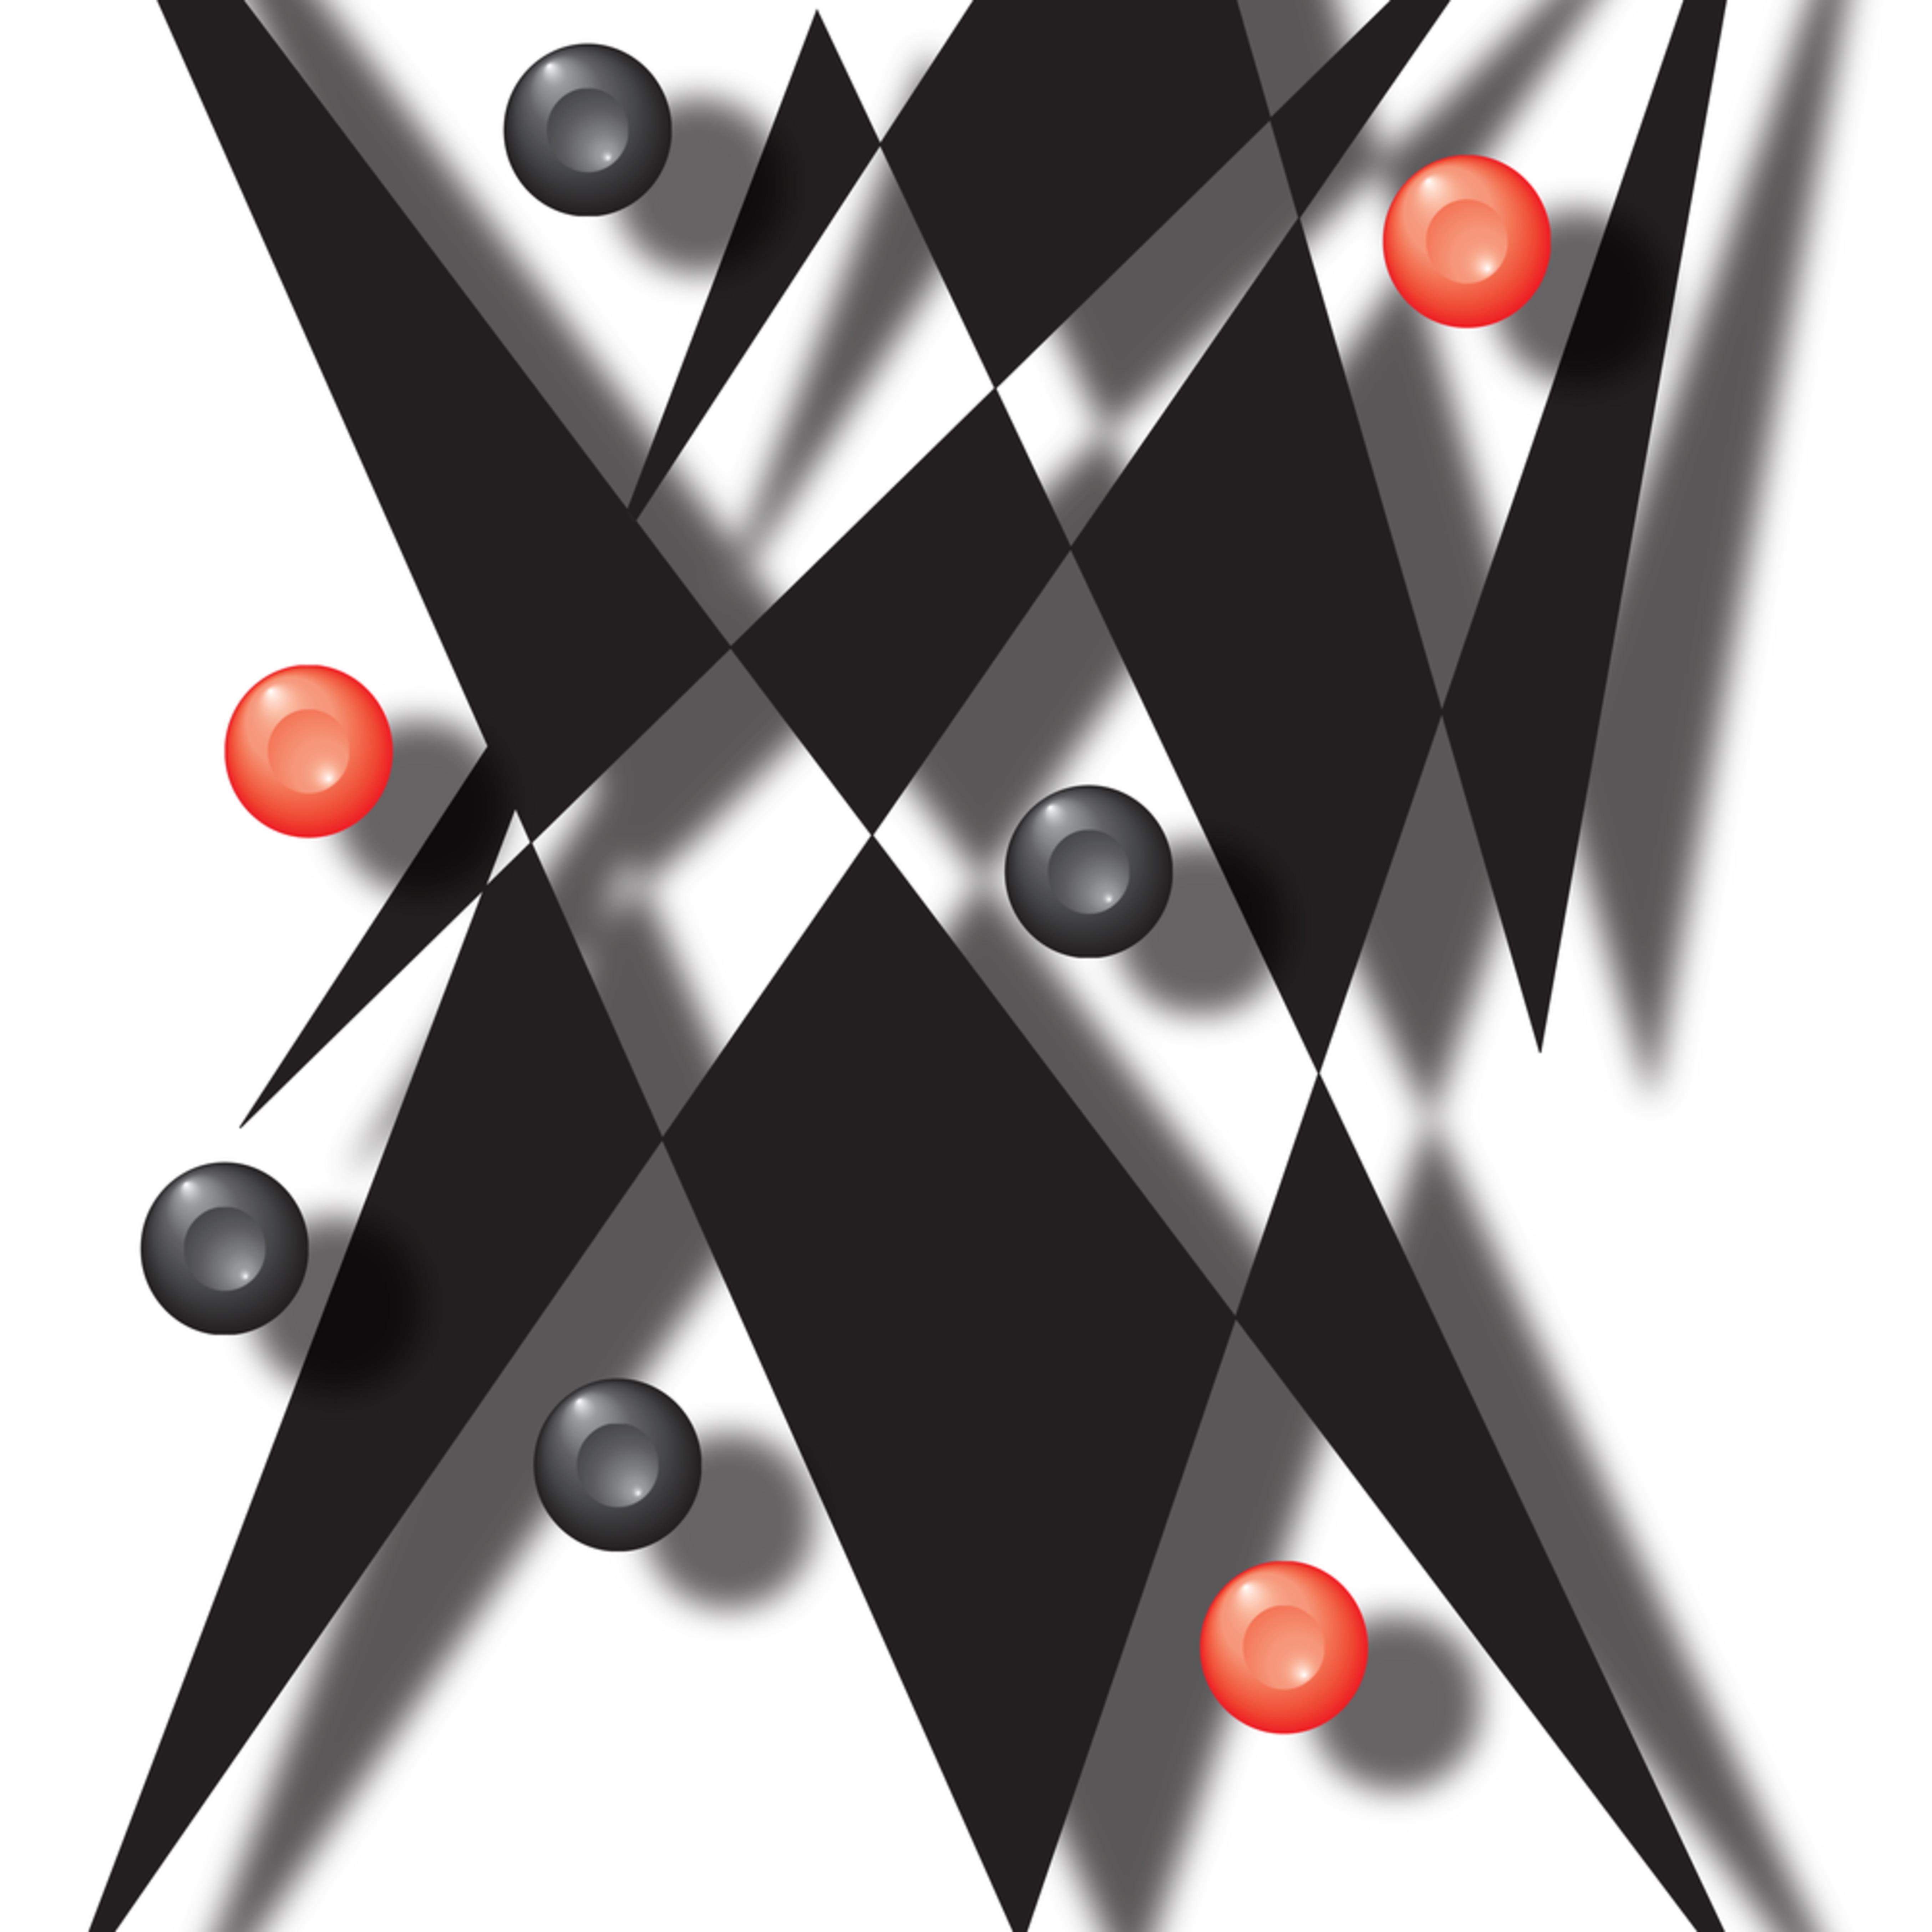 Picasso checkers edited 1 usdqr0